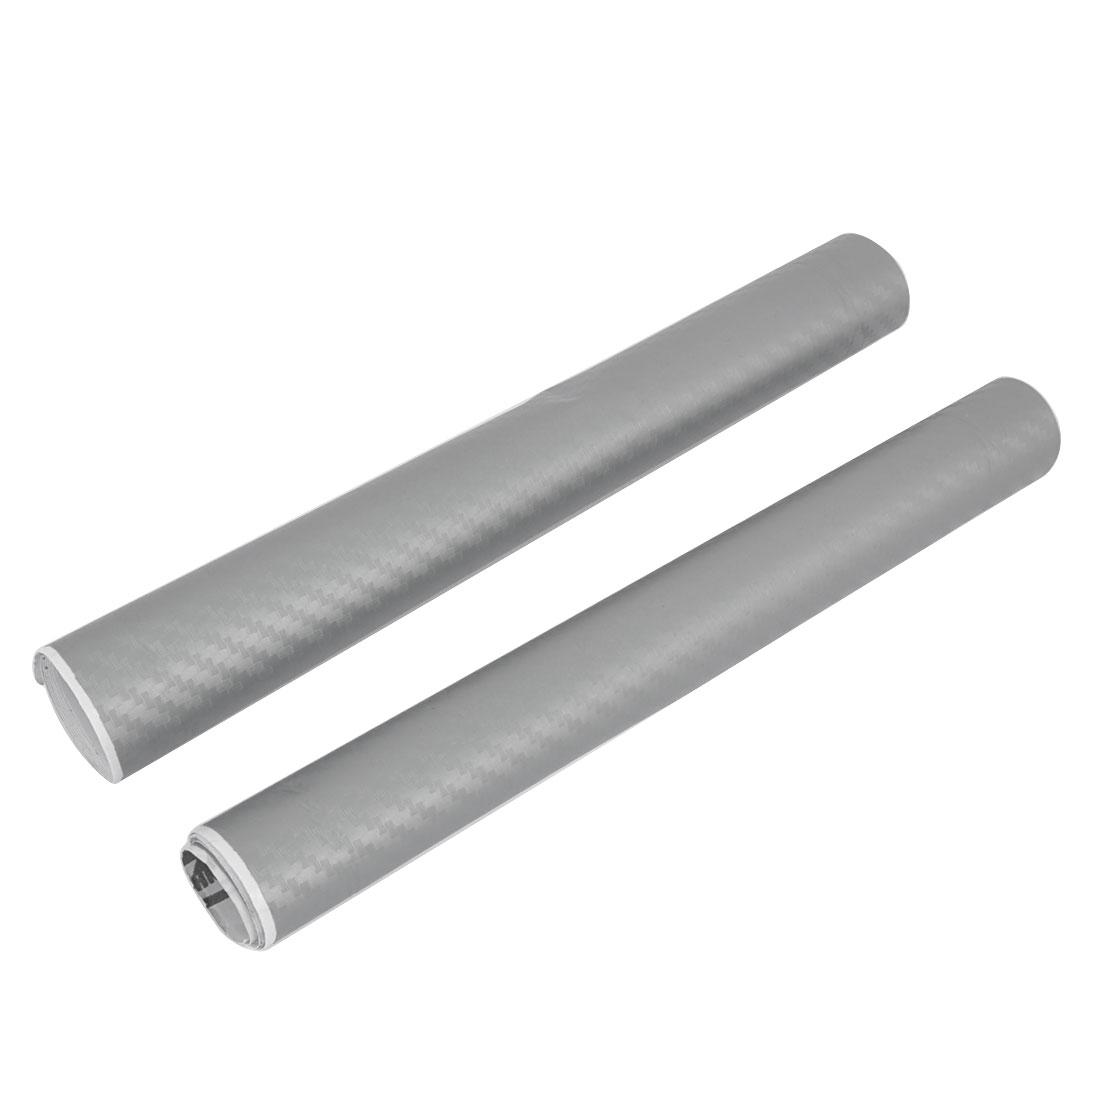 2 Pcs Silver Tone Woven Pattern Carbon Fiber 3D Decal Sticker 50x20cm for Car